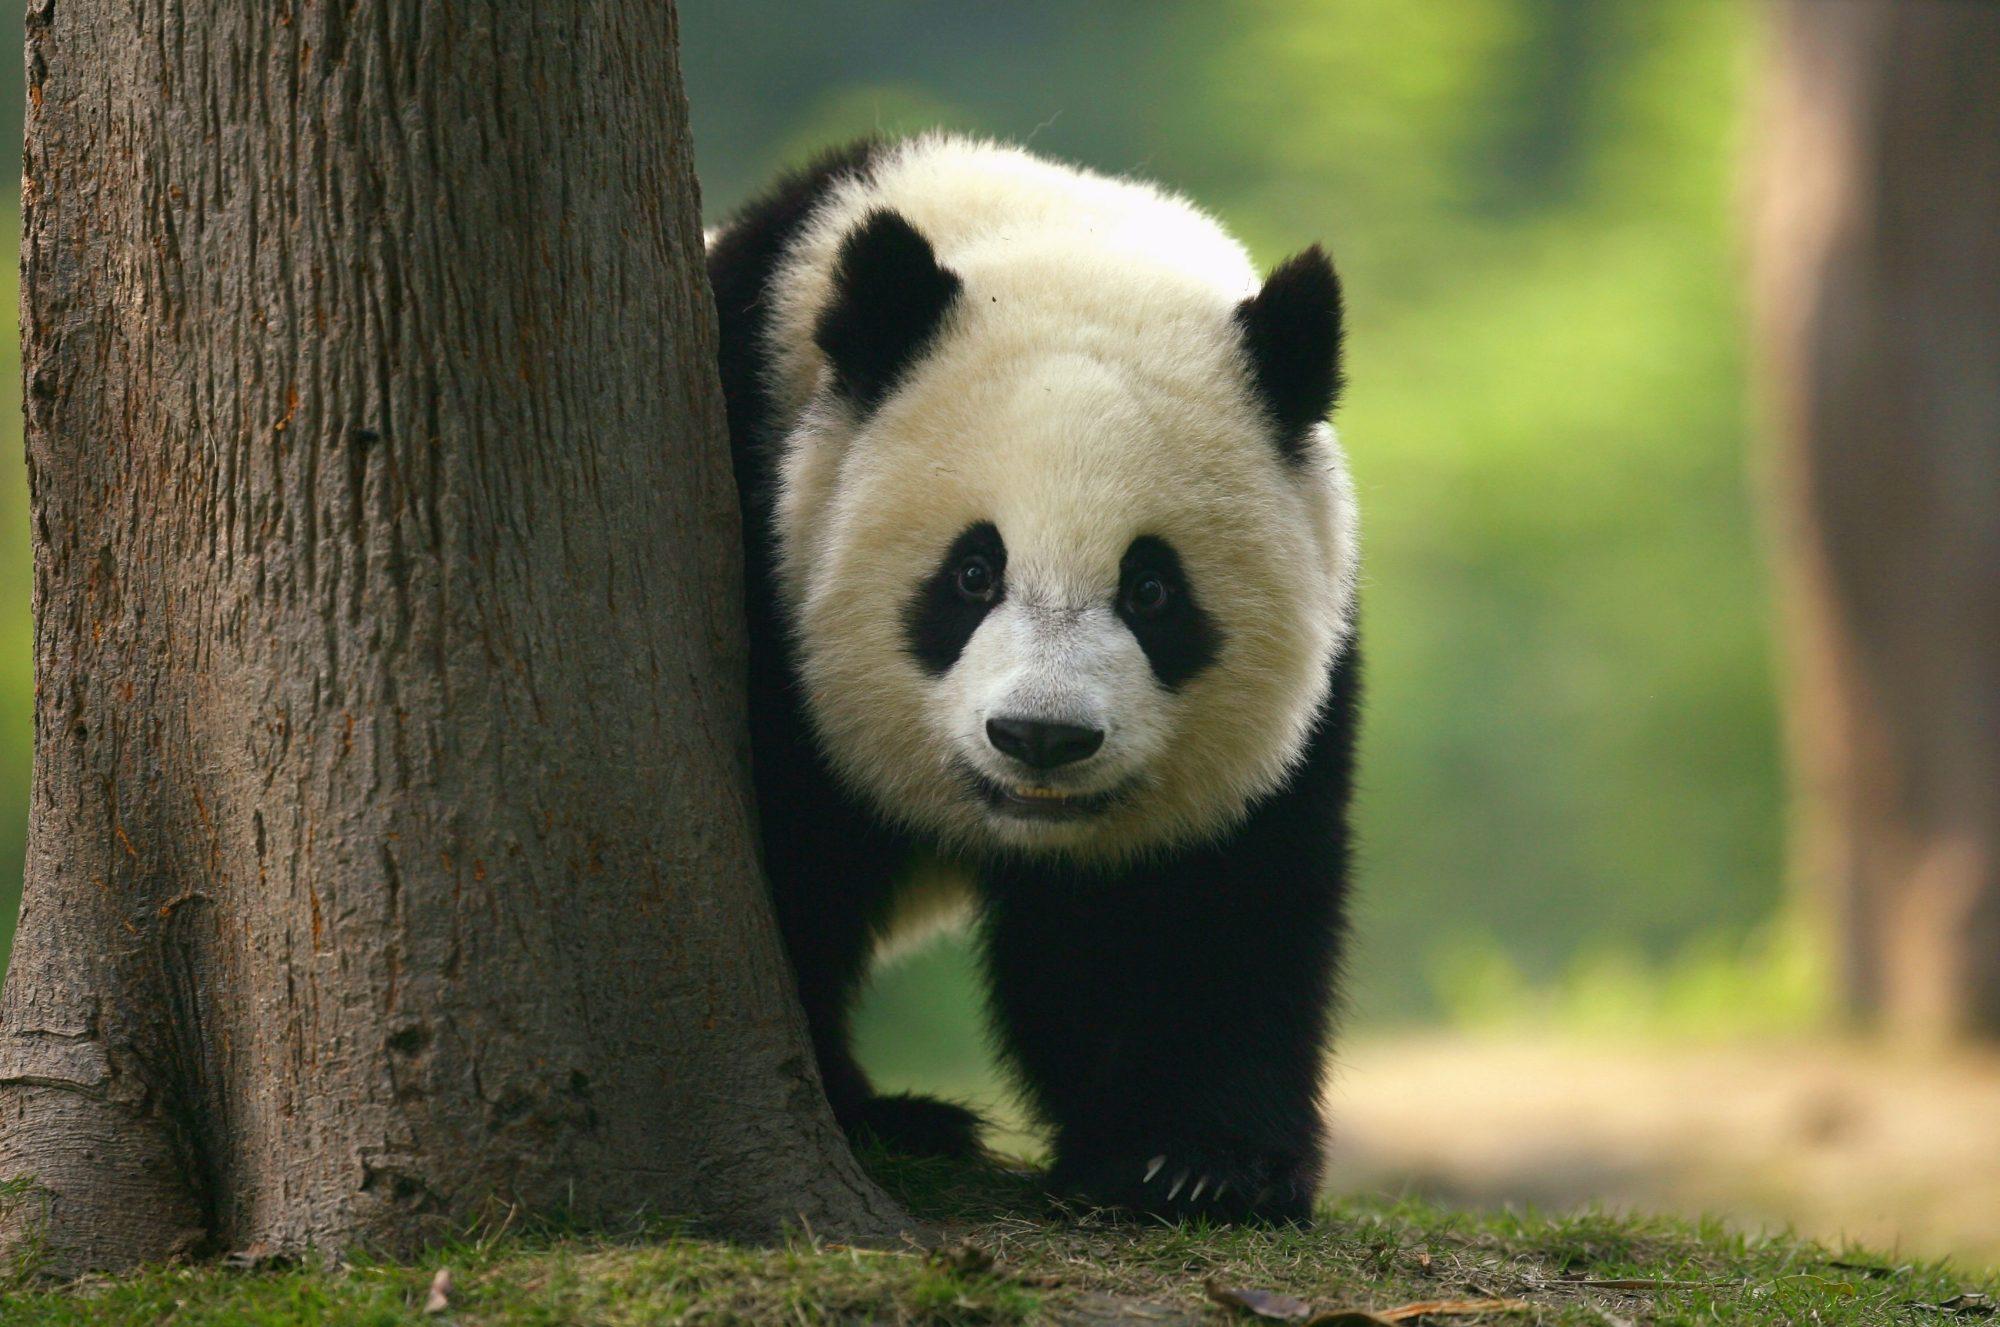 Pandas On Show At China's Largest Breeding Programme